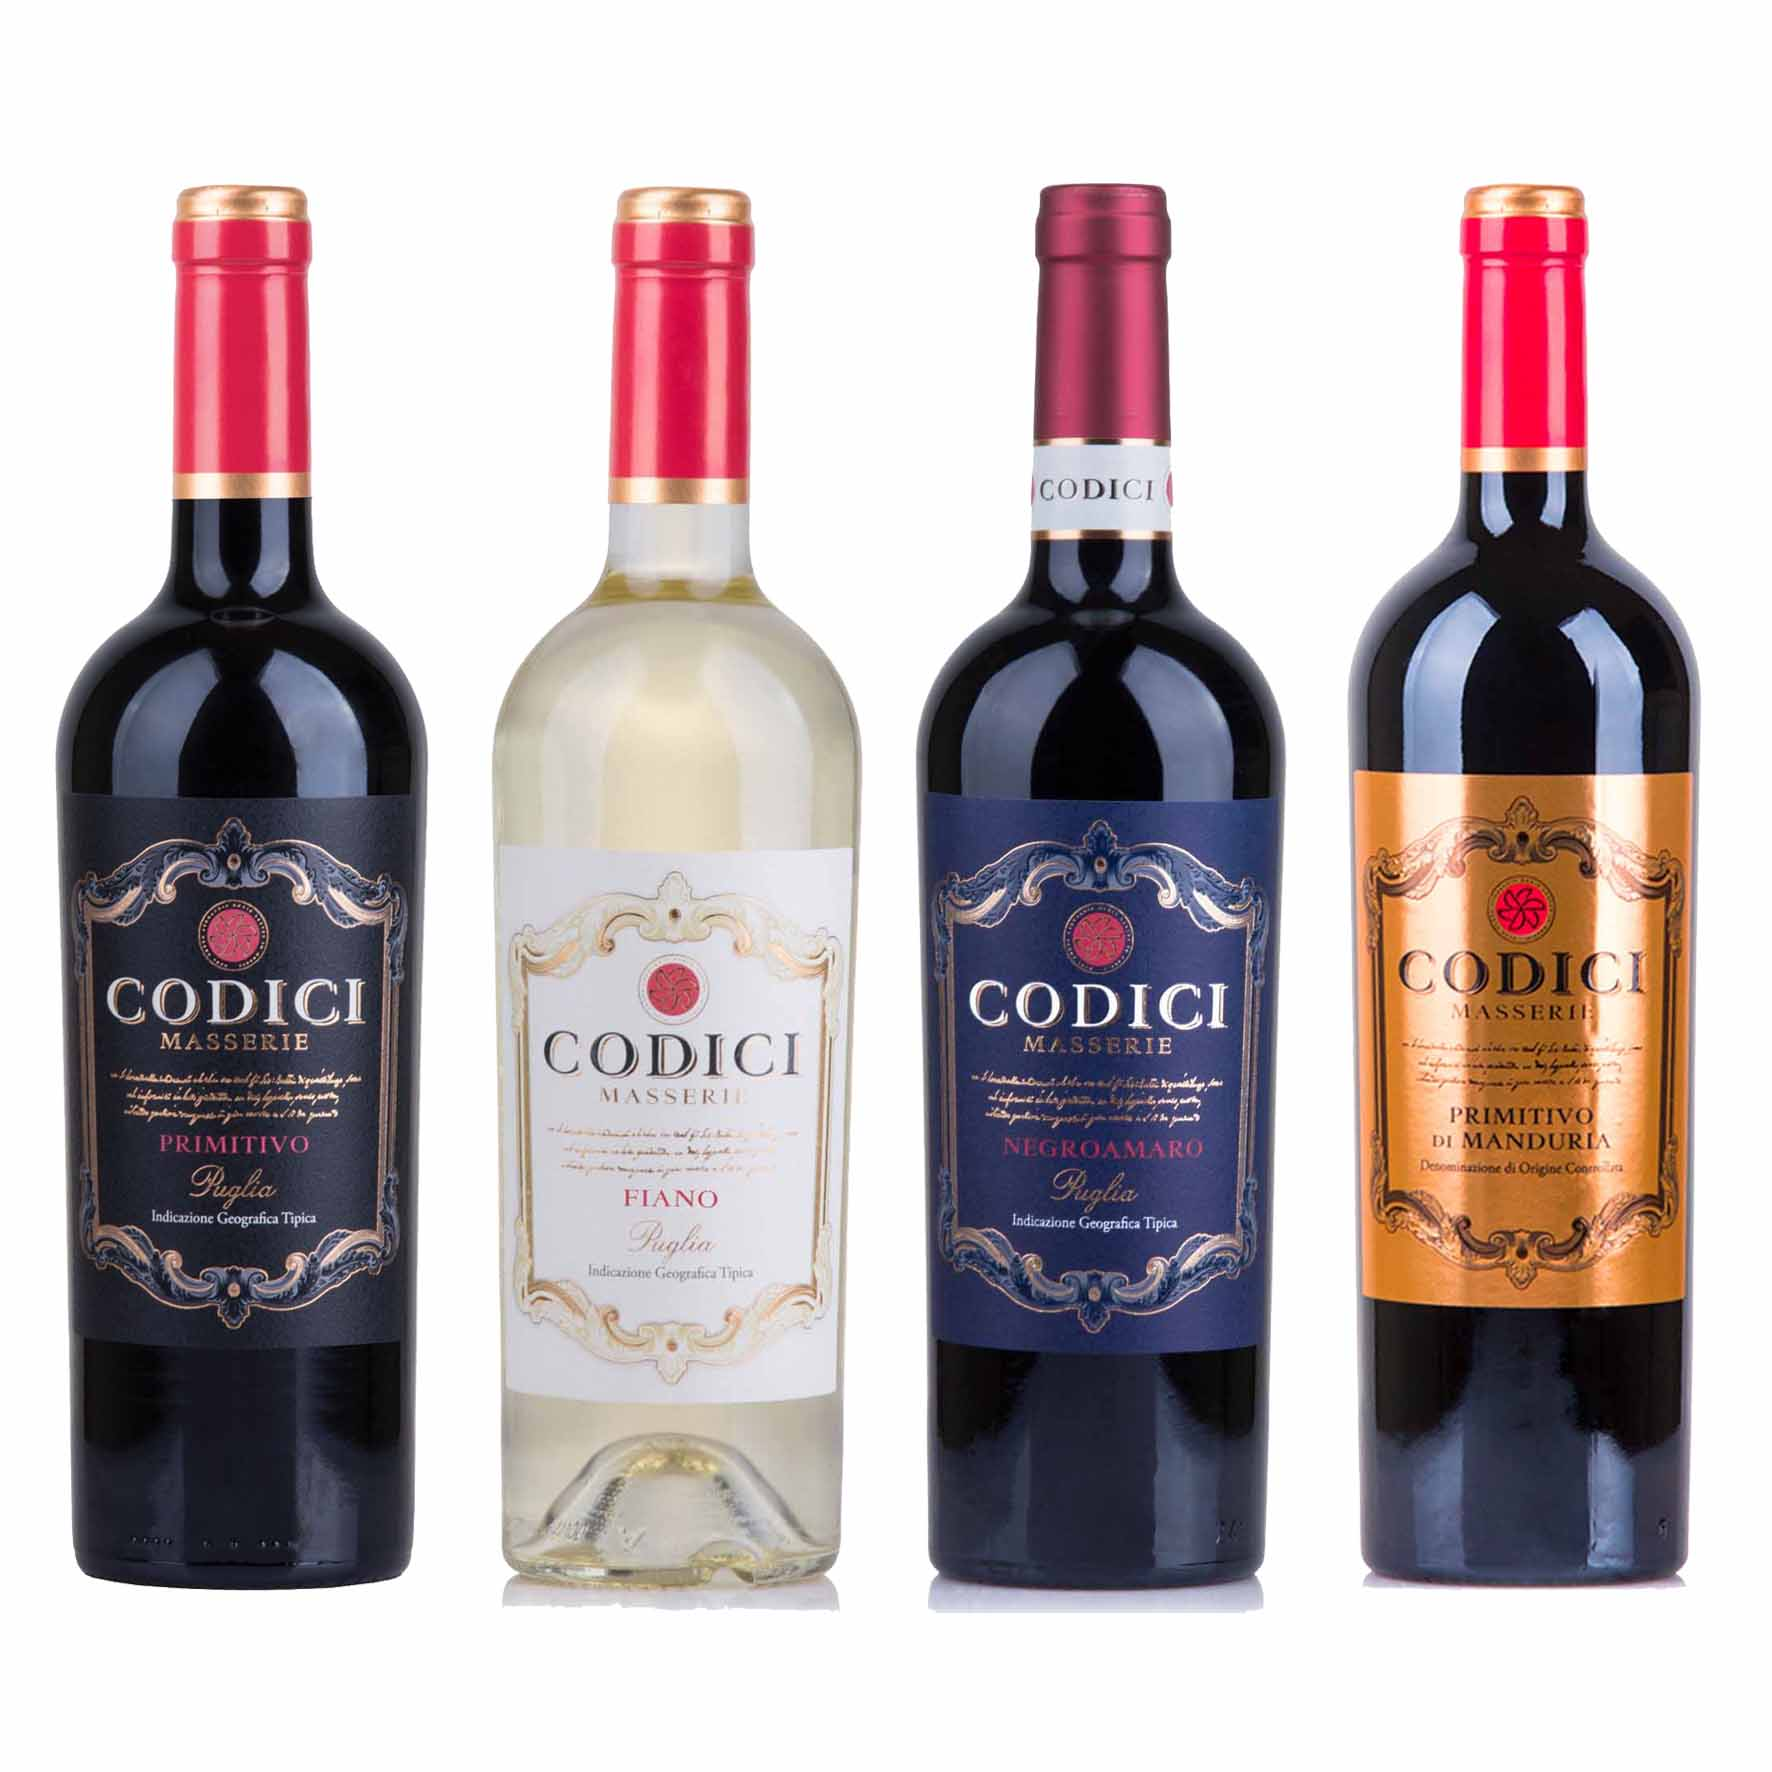 Kit 4x Vinhos Italianos Tinto/Branco Primitivo/Fiano/Negroamaro Puglia/Di Manduria IGT Codici